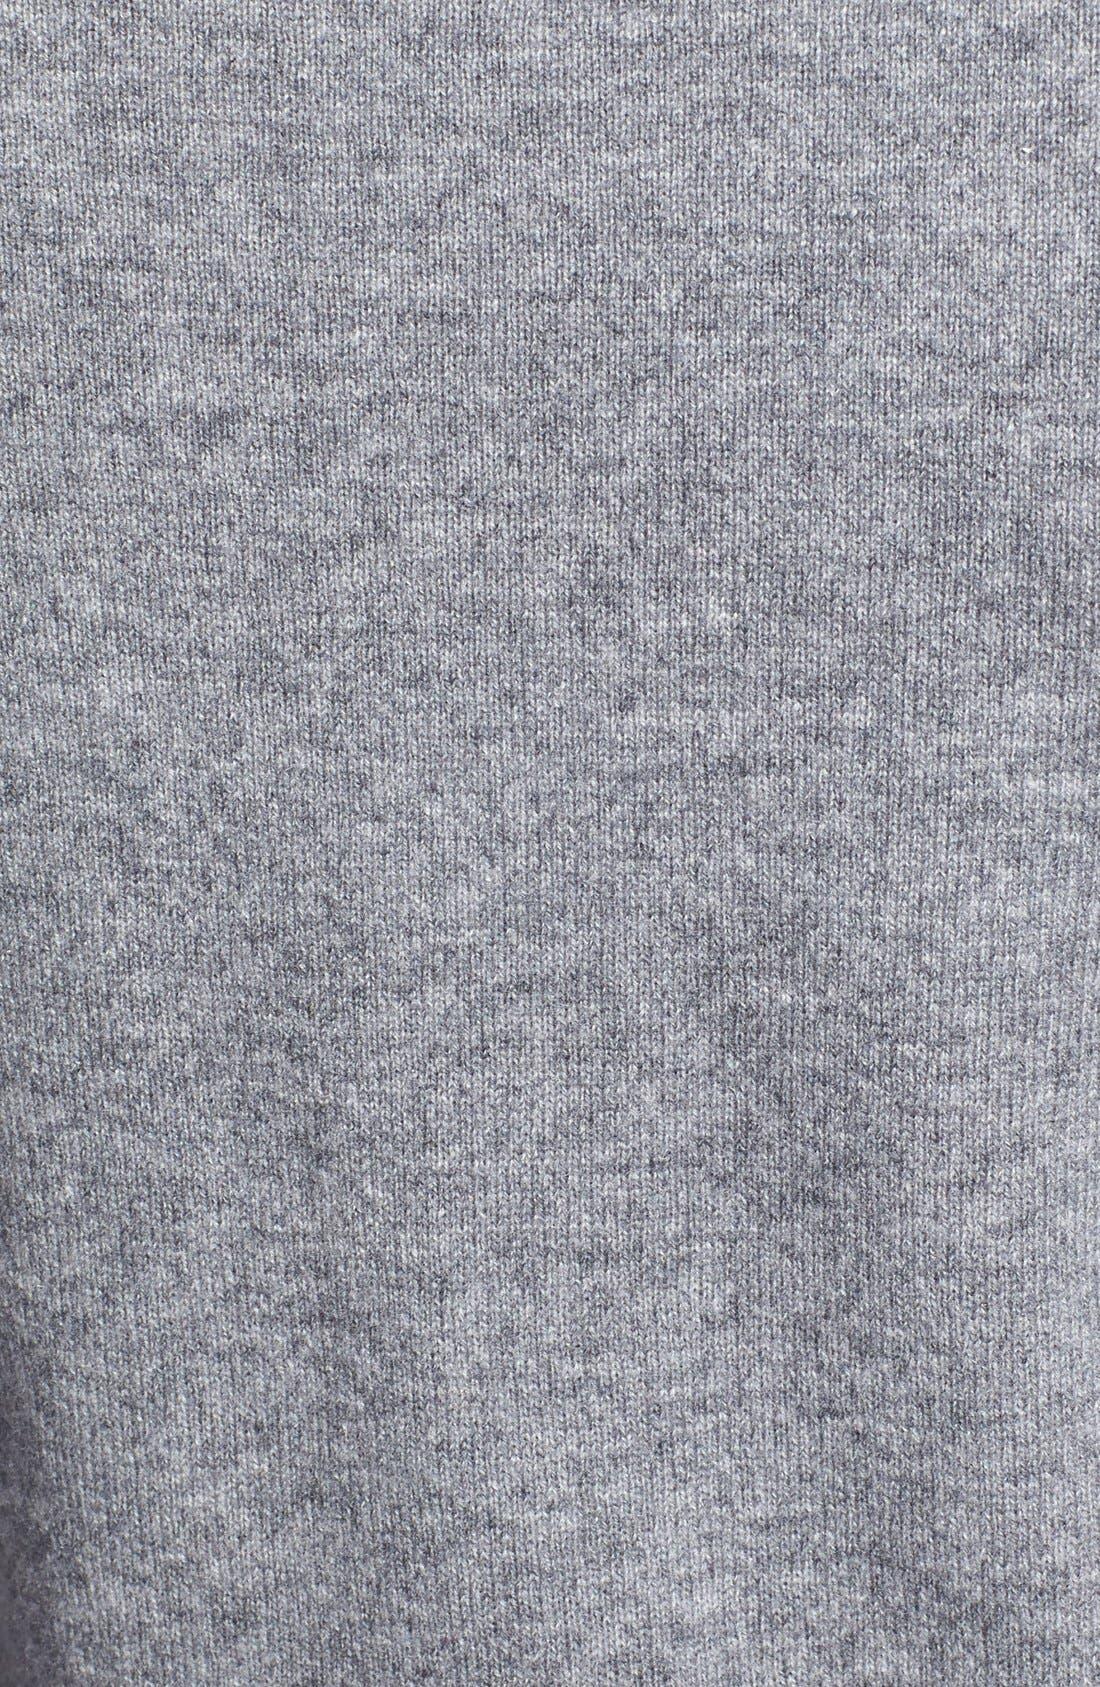 Alternate Image 3  - Nordstrom Collection Long Cashmere Turtleneck Sweater